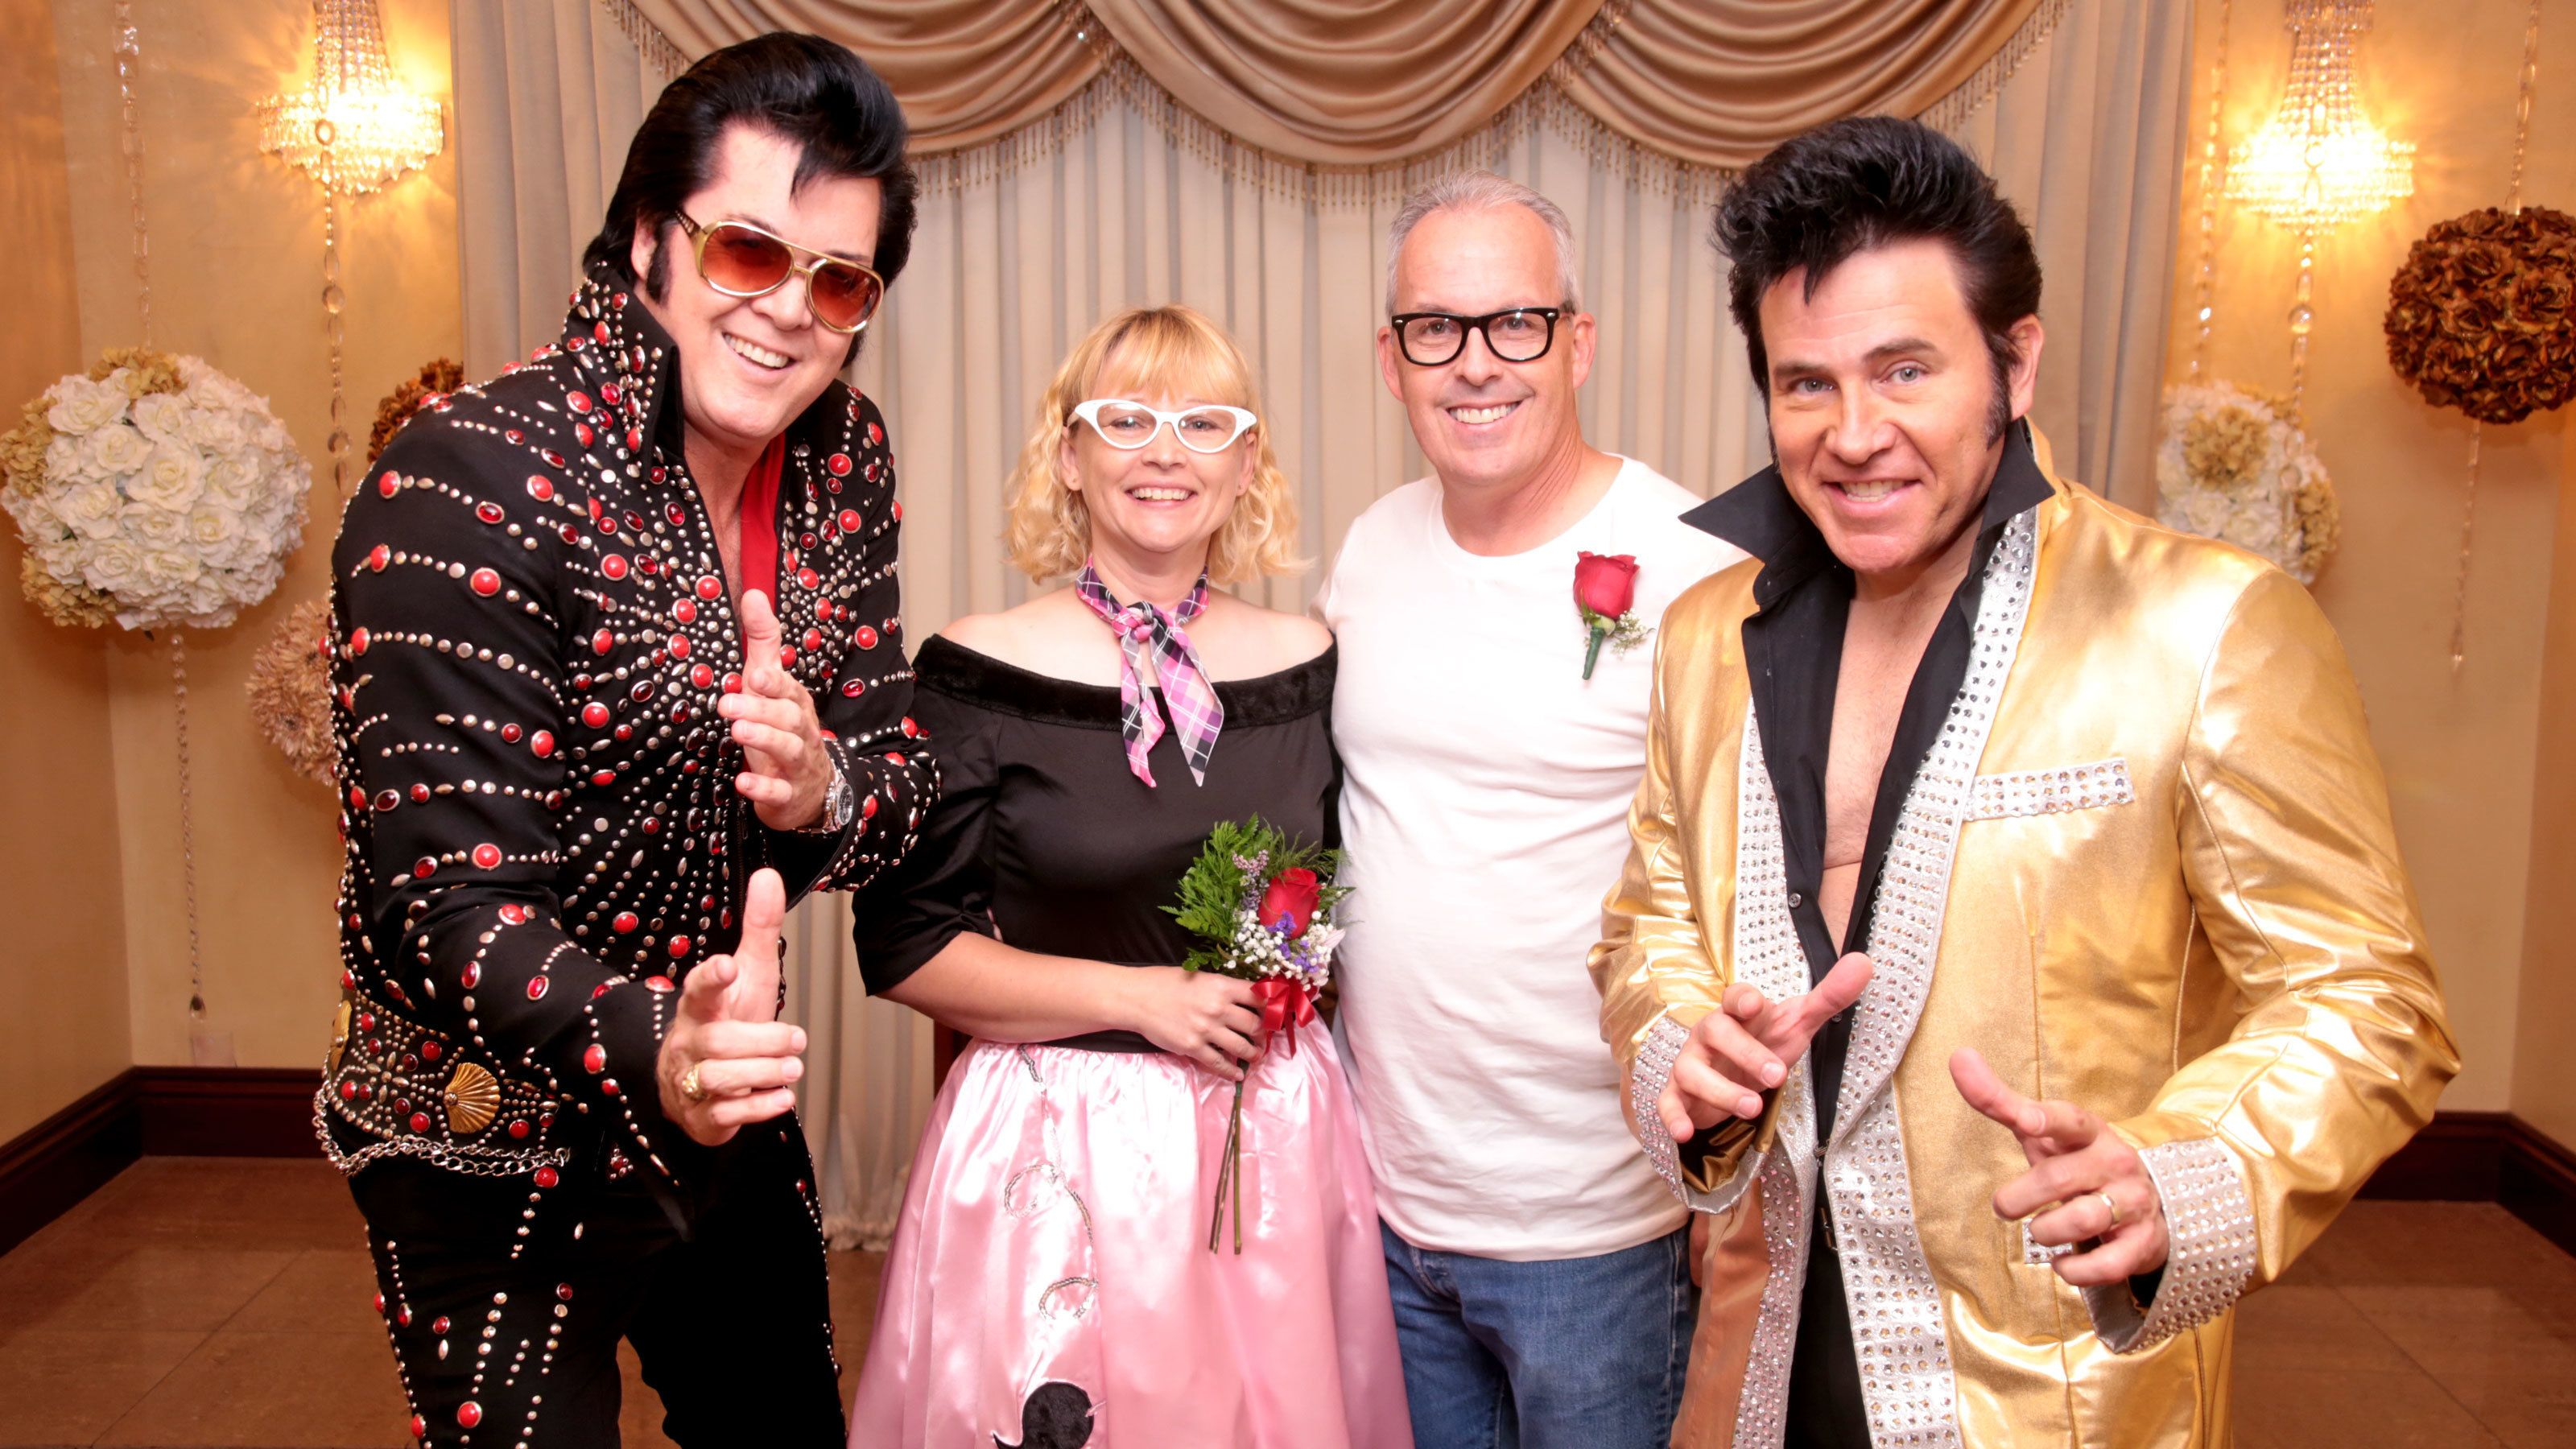 Dueling Elvis Wedding at Graceland Wedding Chapel